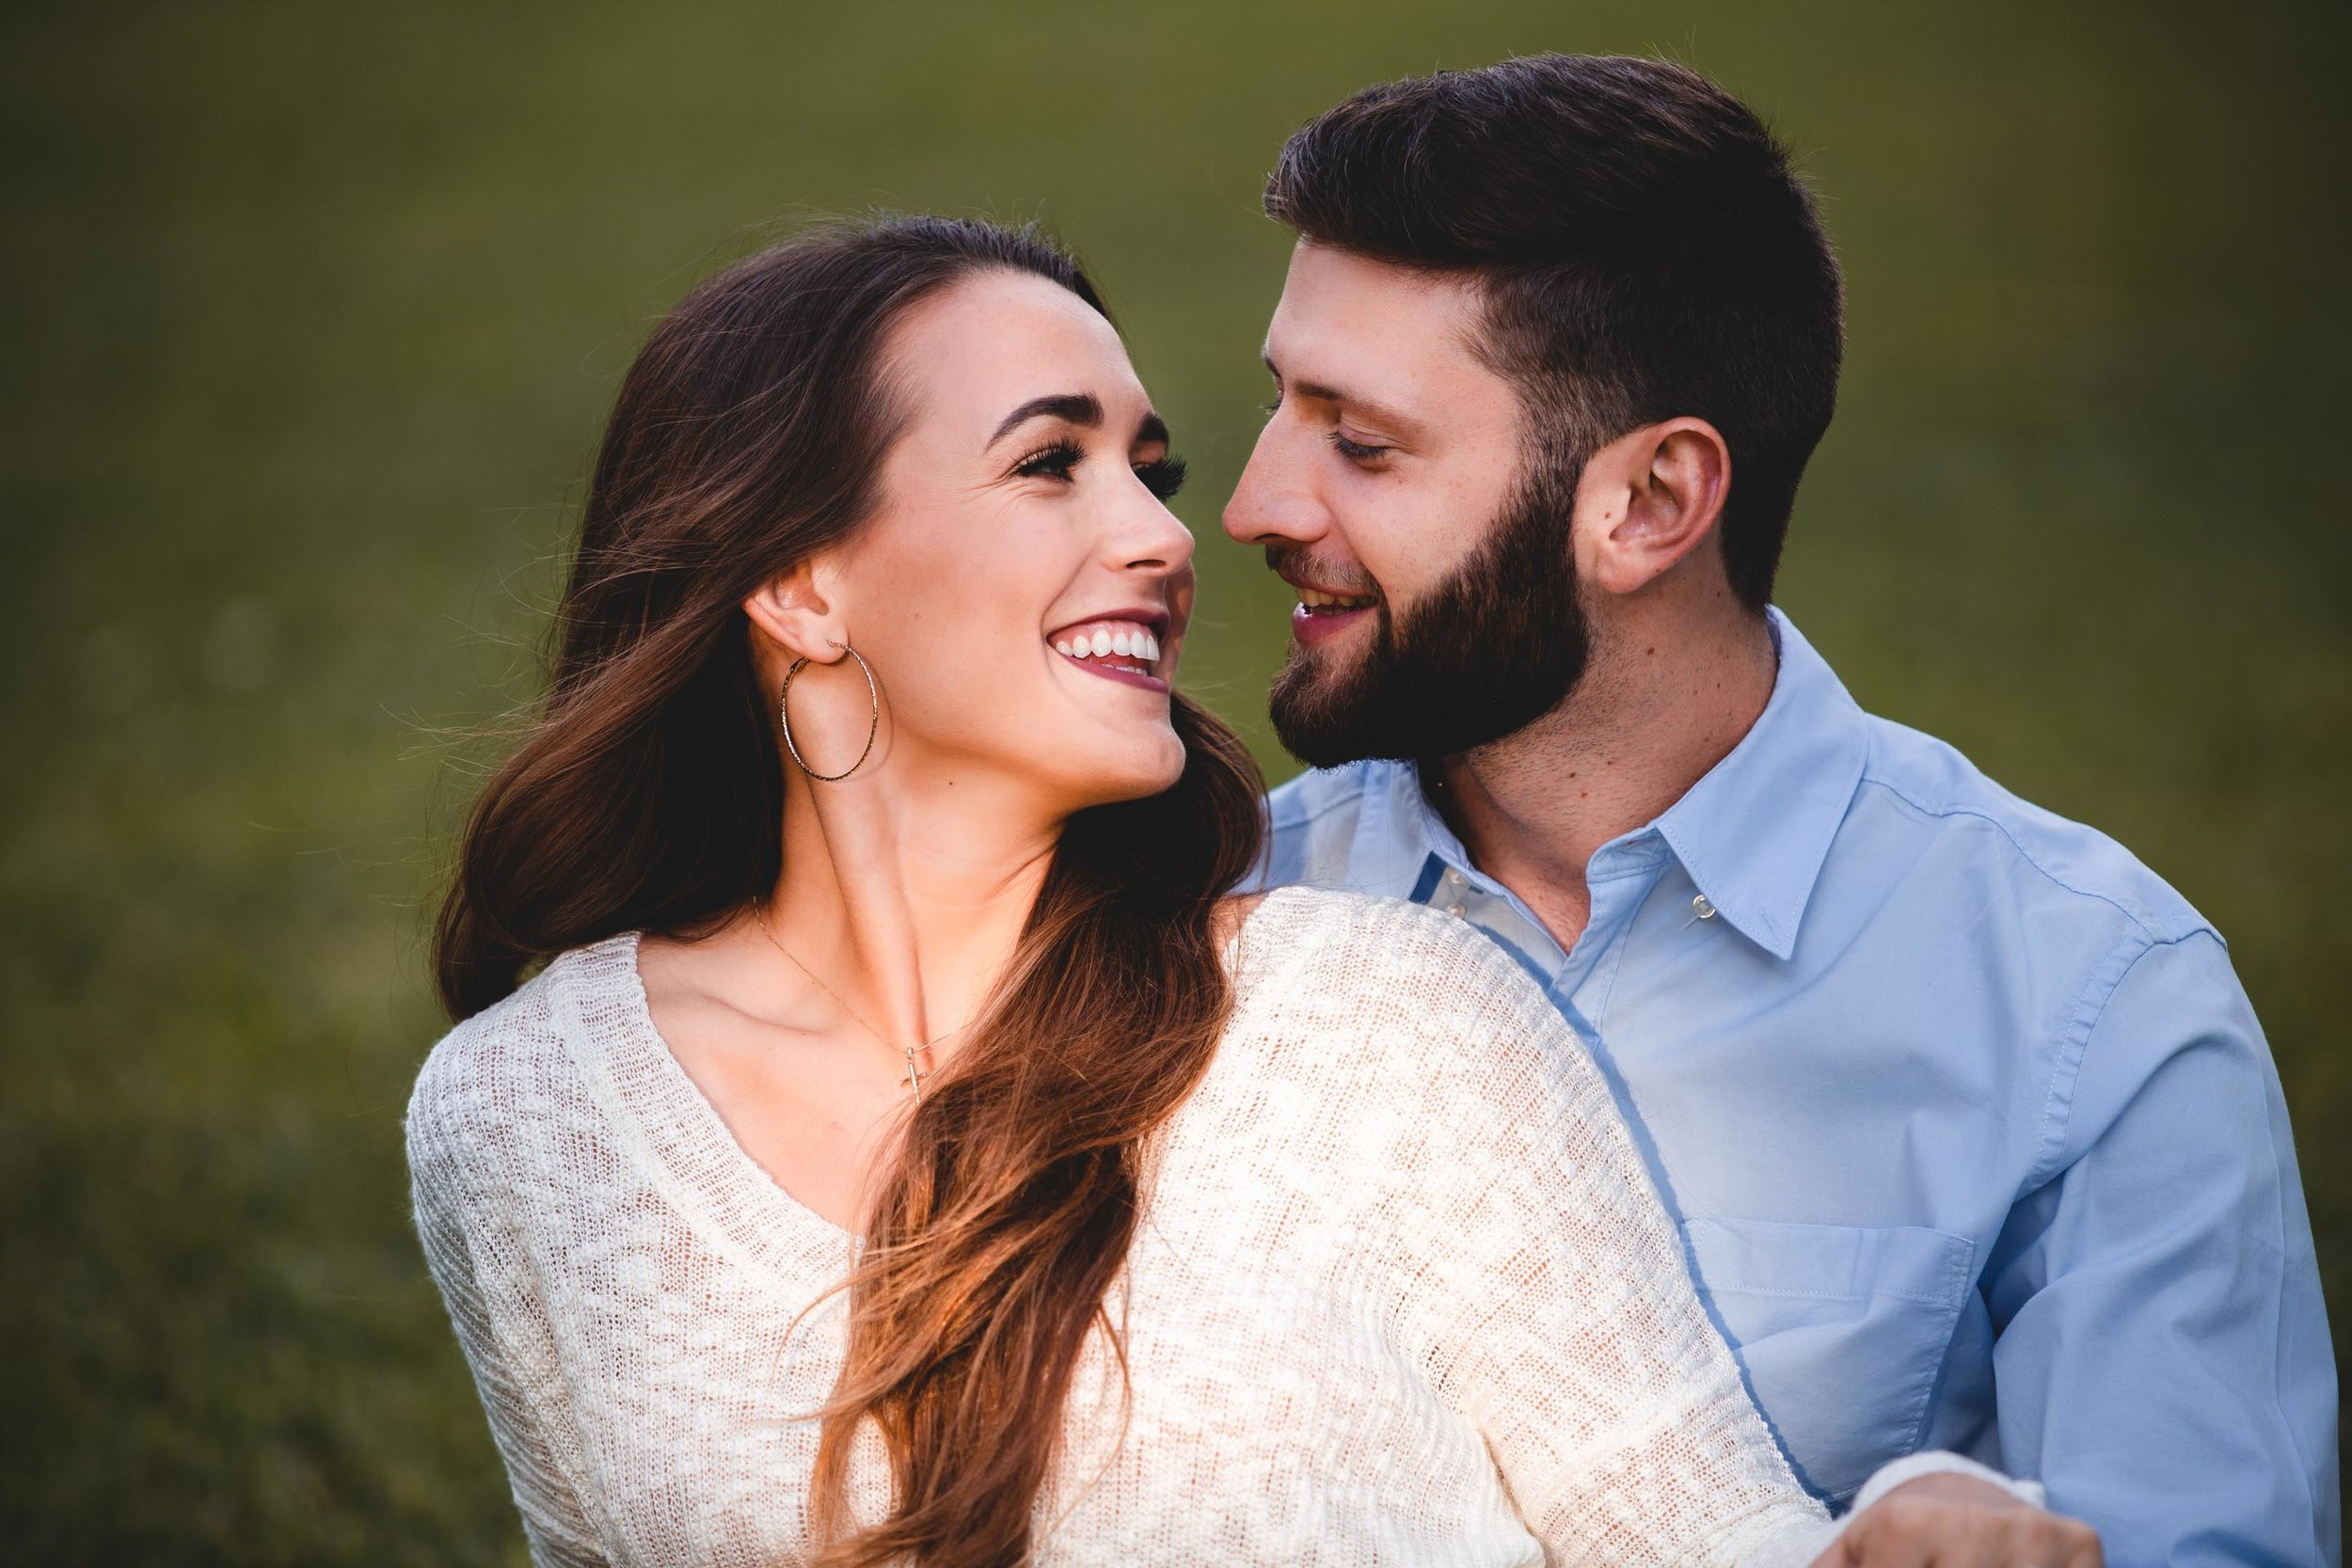 adam-szarmack-jacksonville-wedding-photographer-palm-coast-washing-oaks-garden-state-park-engagement-35.jpg